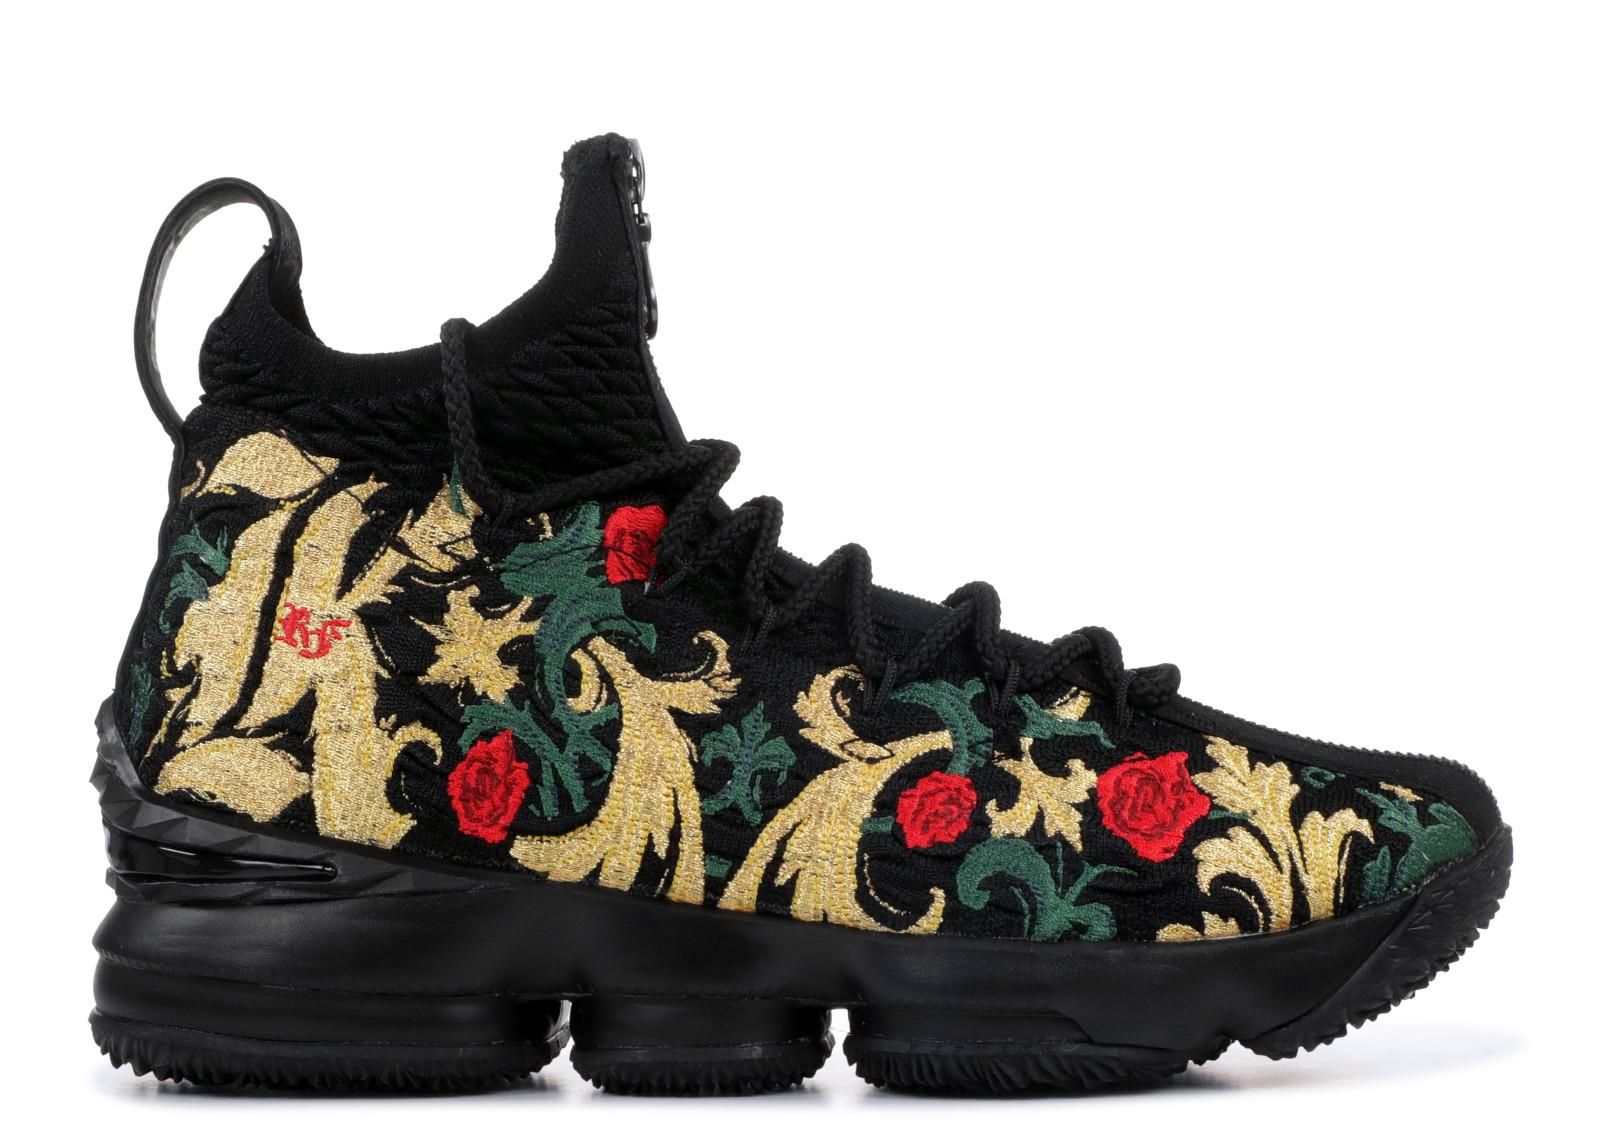 on sale b4e8c f4b28 Kick Avenue - Authentic Sneakers